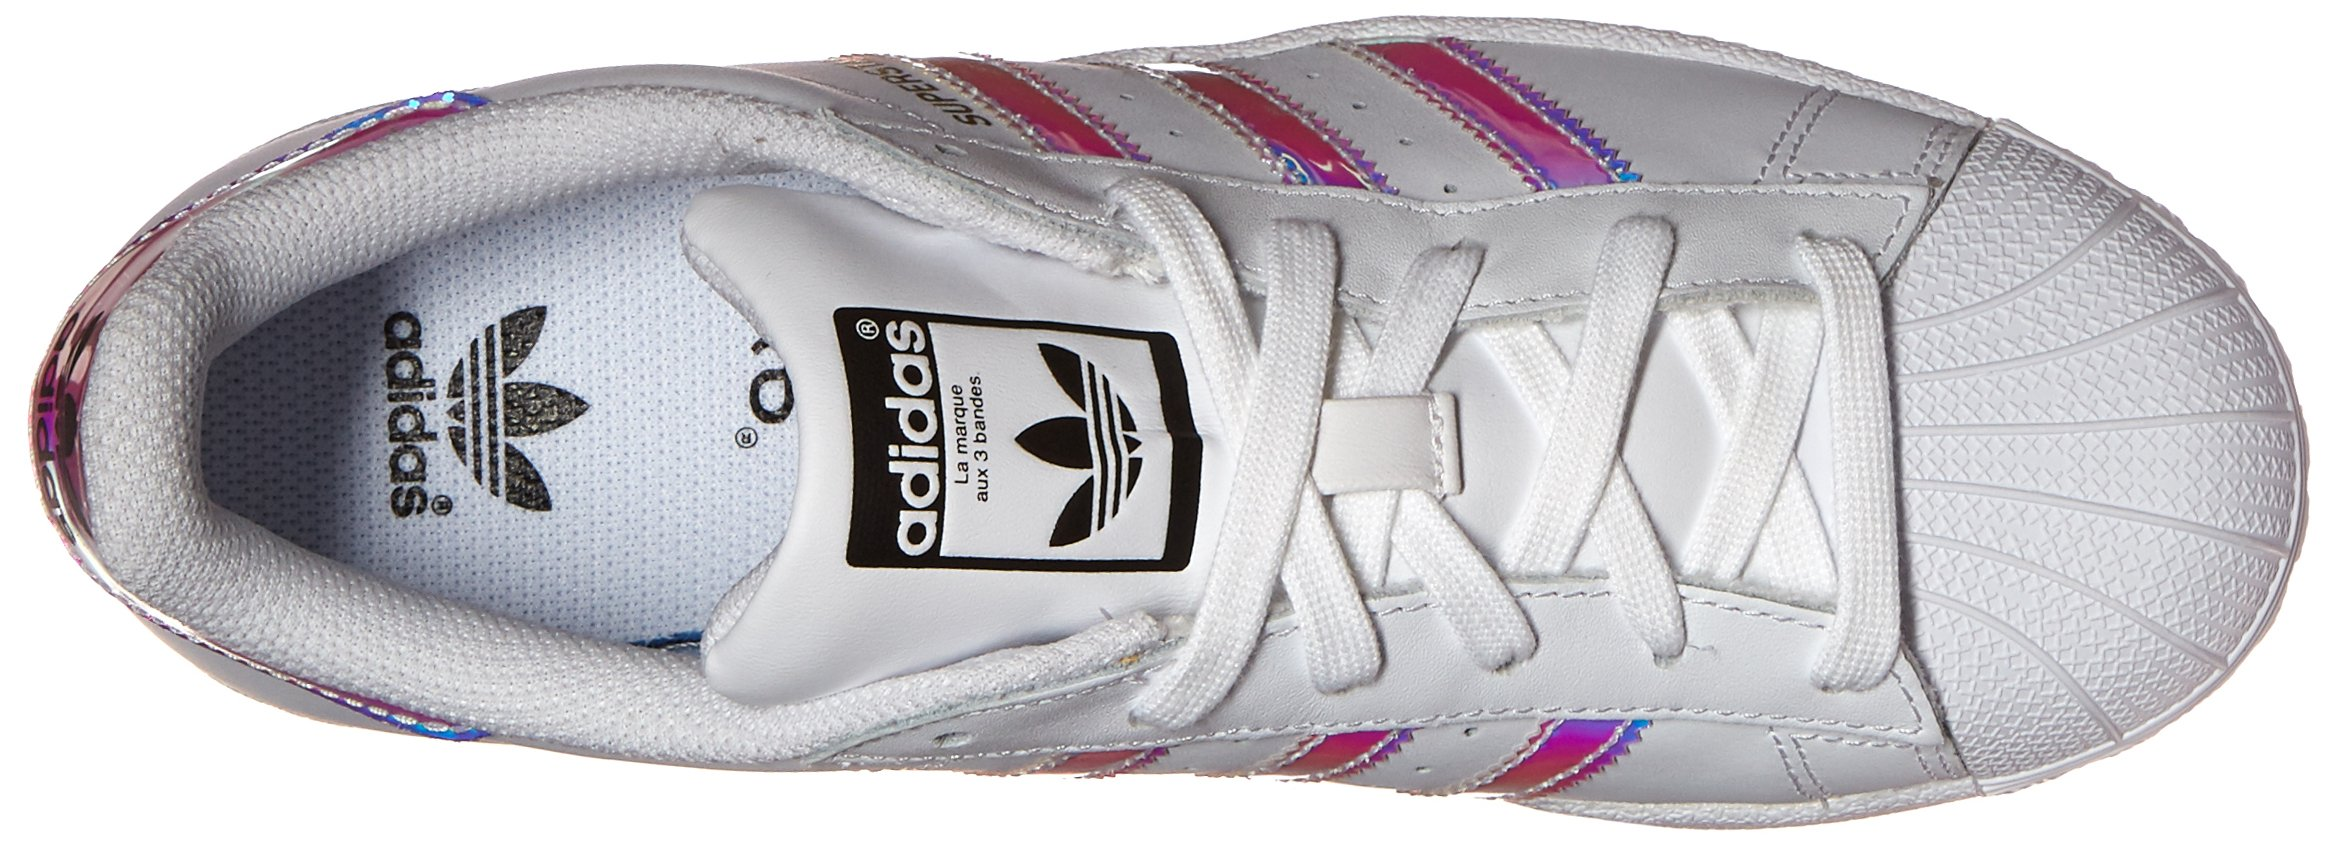 adidas Originals Kid's Superstar J Shoe, White/White/Metallic Silver, 4 M US Big Kid by adidas Originals (Image #8)